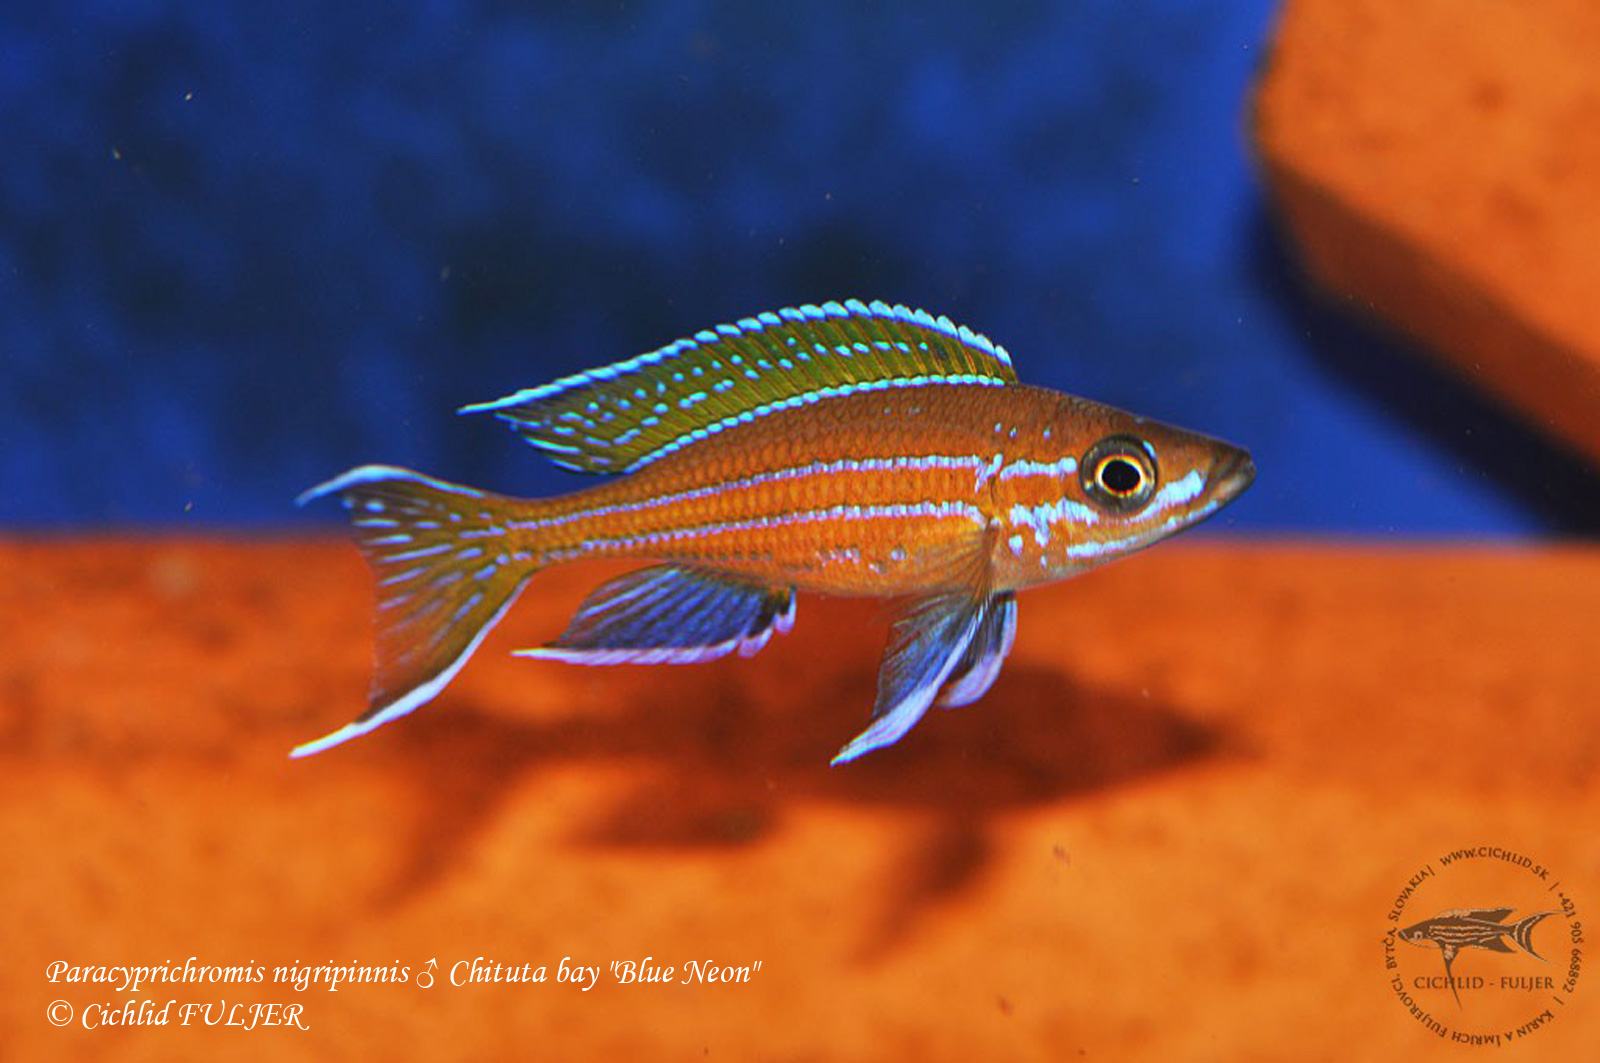 Paracyprichromis nigripinnis chituta bay